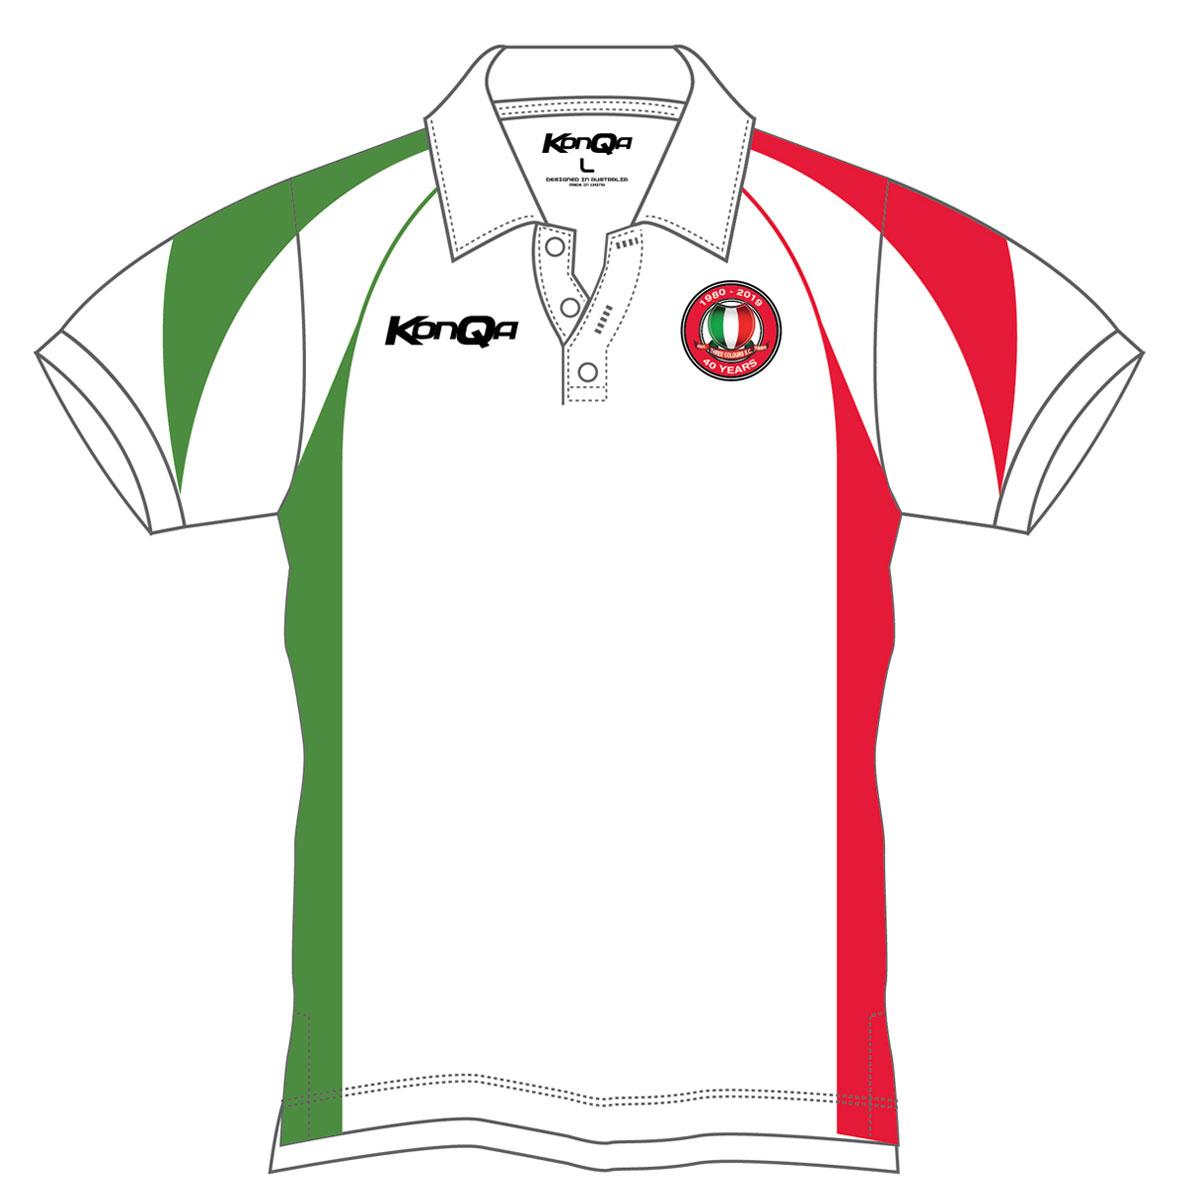 https://threecolours.com.au/wp-content/uploads/2019/02/sponsor-jersey-front.jpg